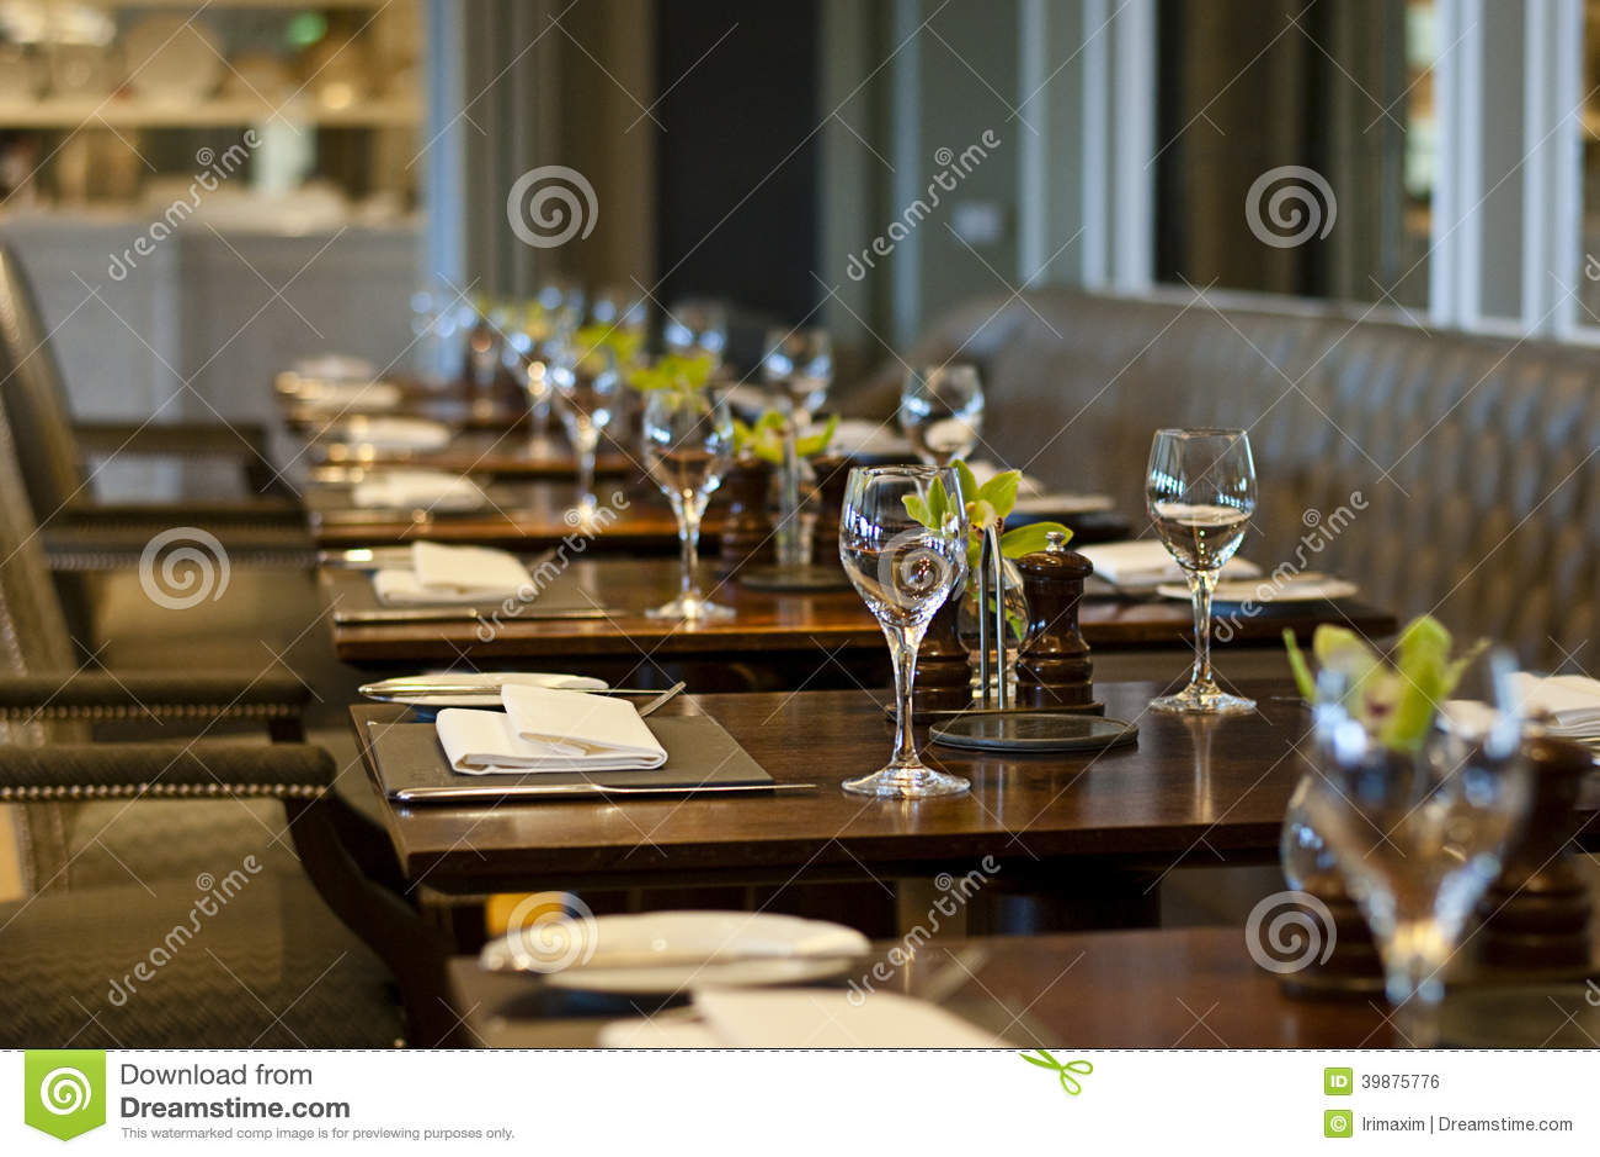 Restaurante acogedor